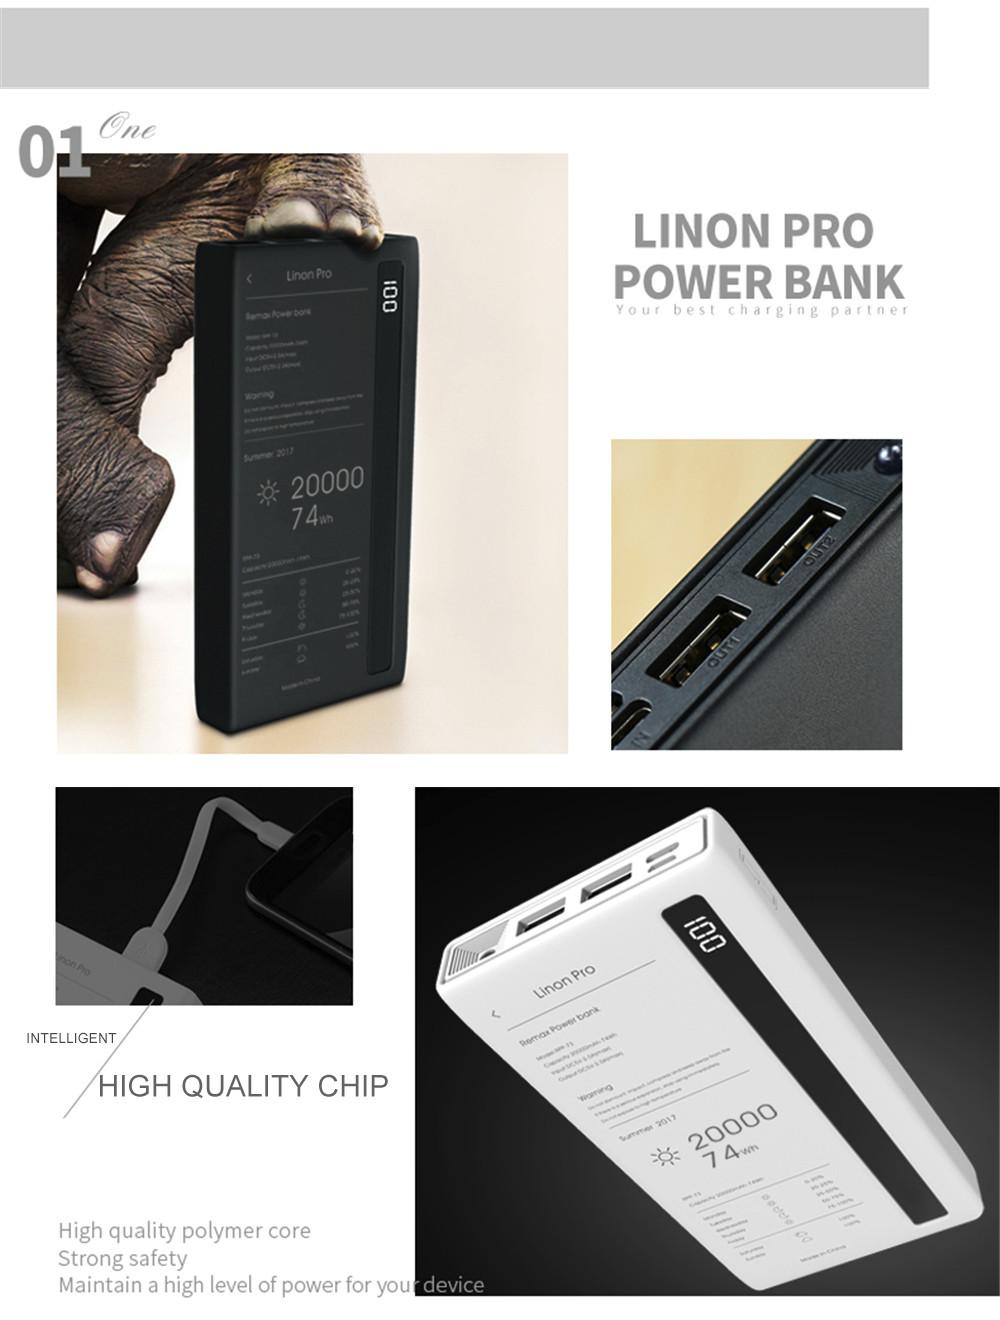 Linon Pro 20,000 mAh Power Bank